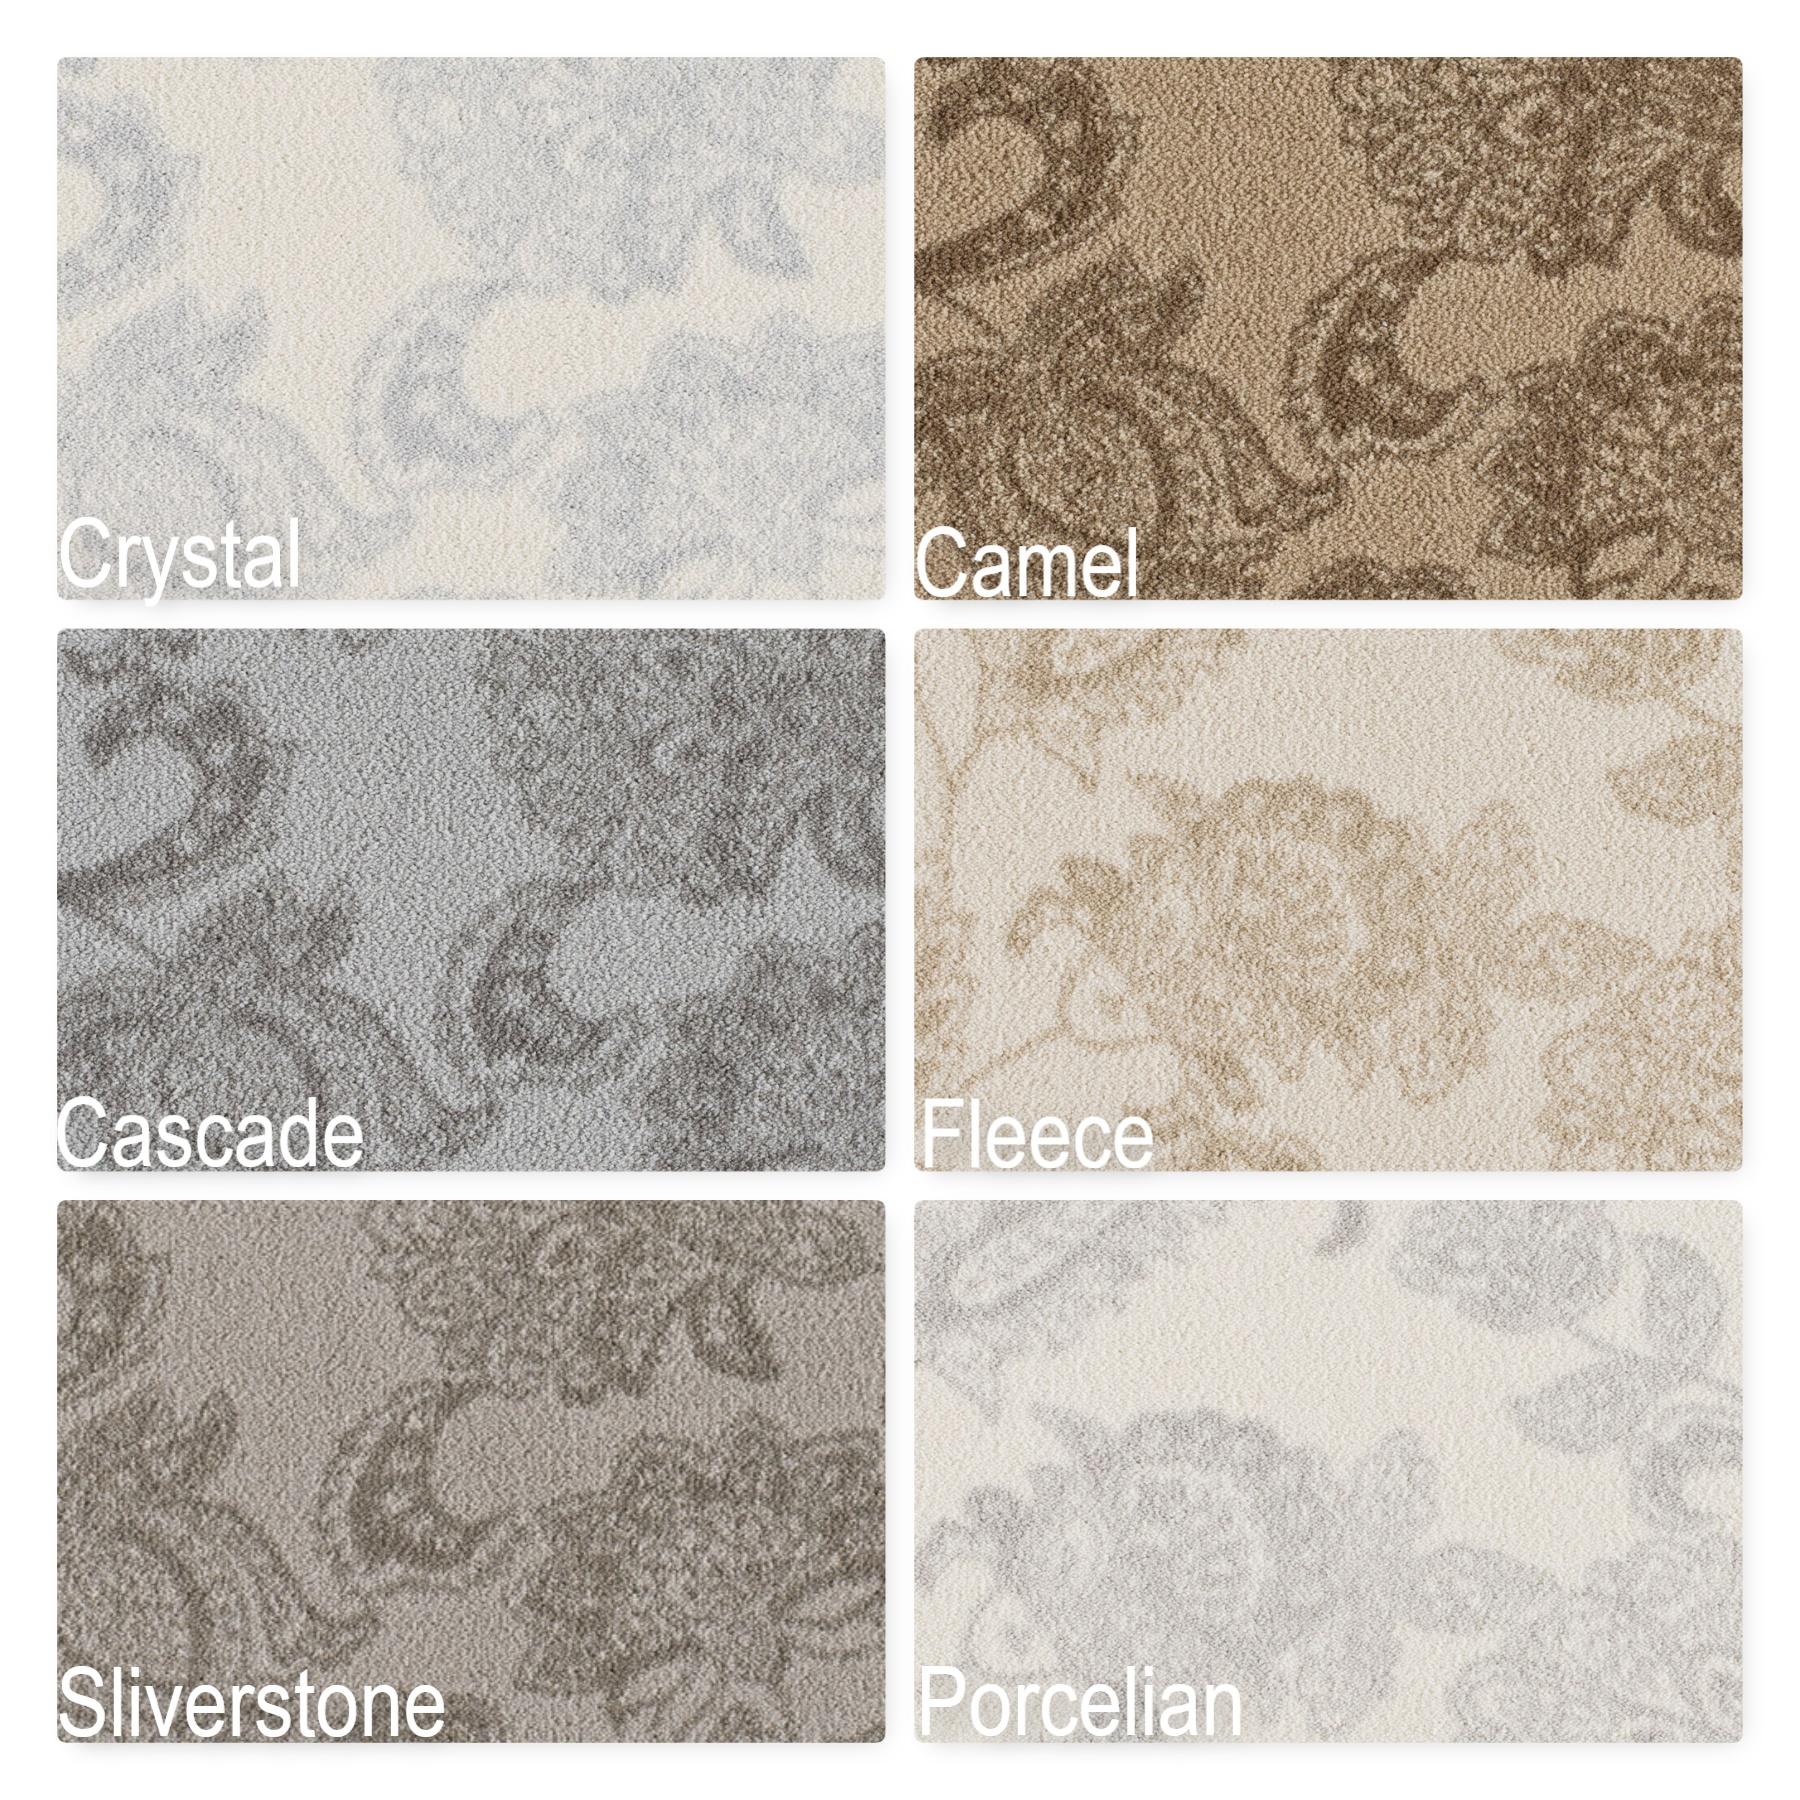 Milliken Arietta Indoor Floral Pattern Area Rug Collection